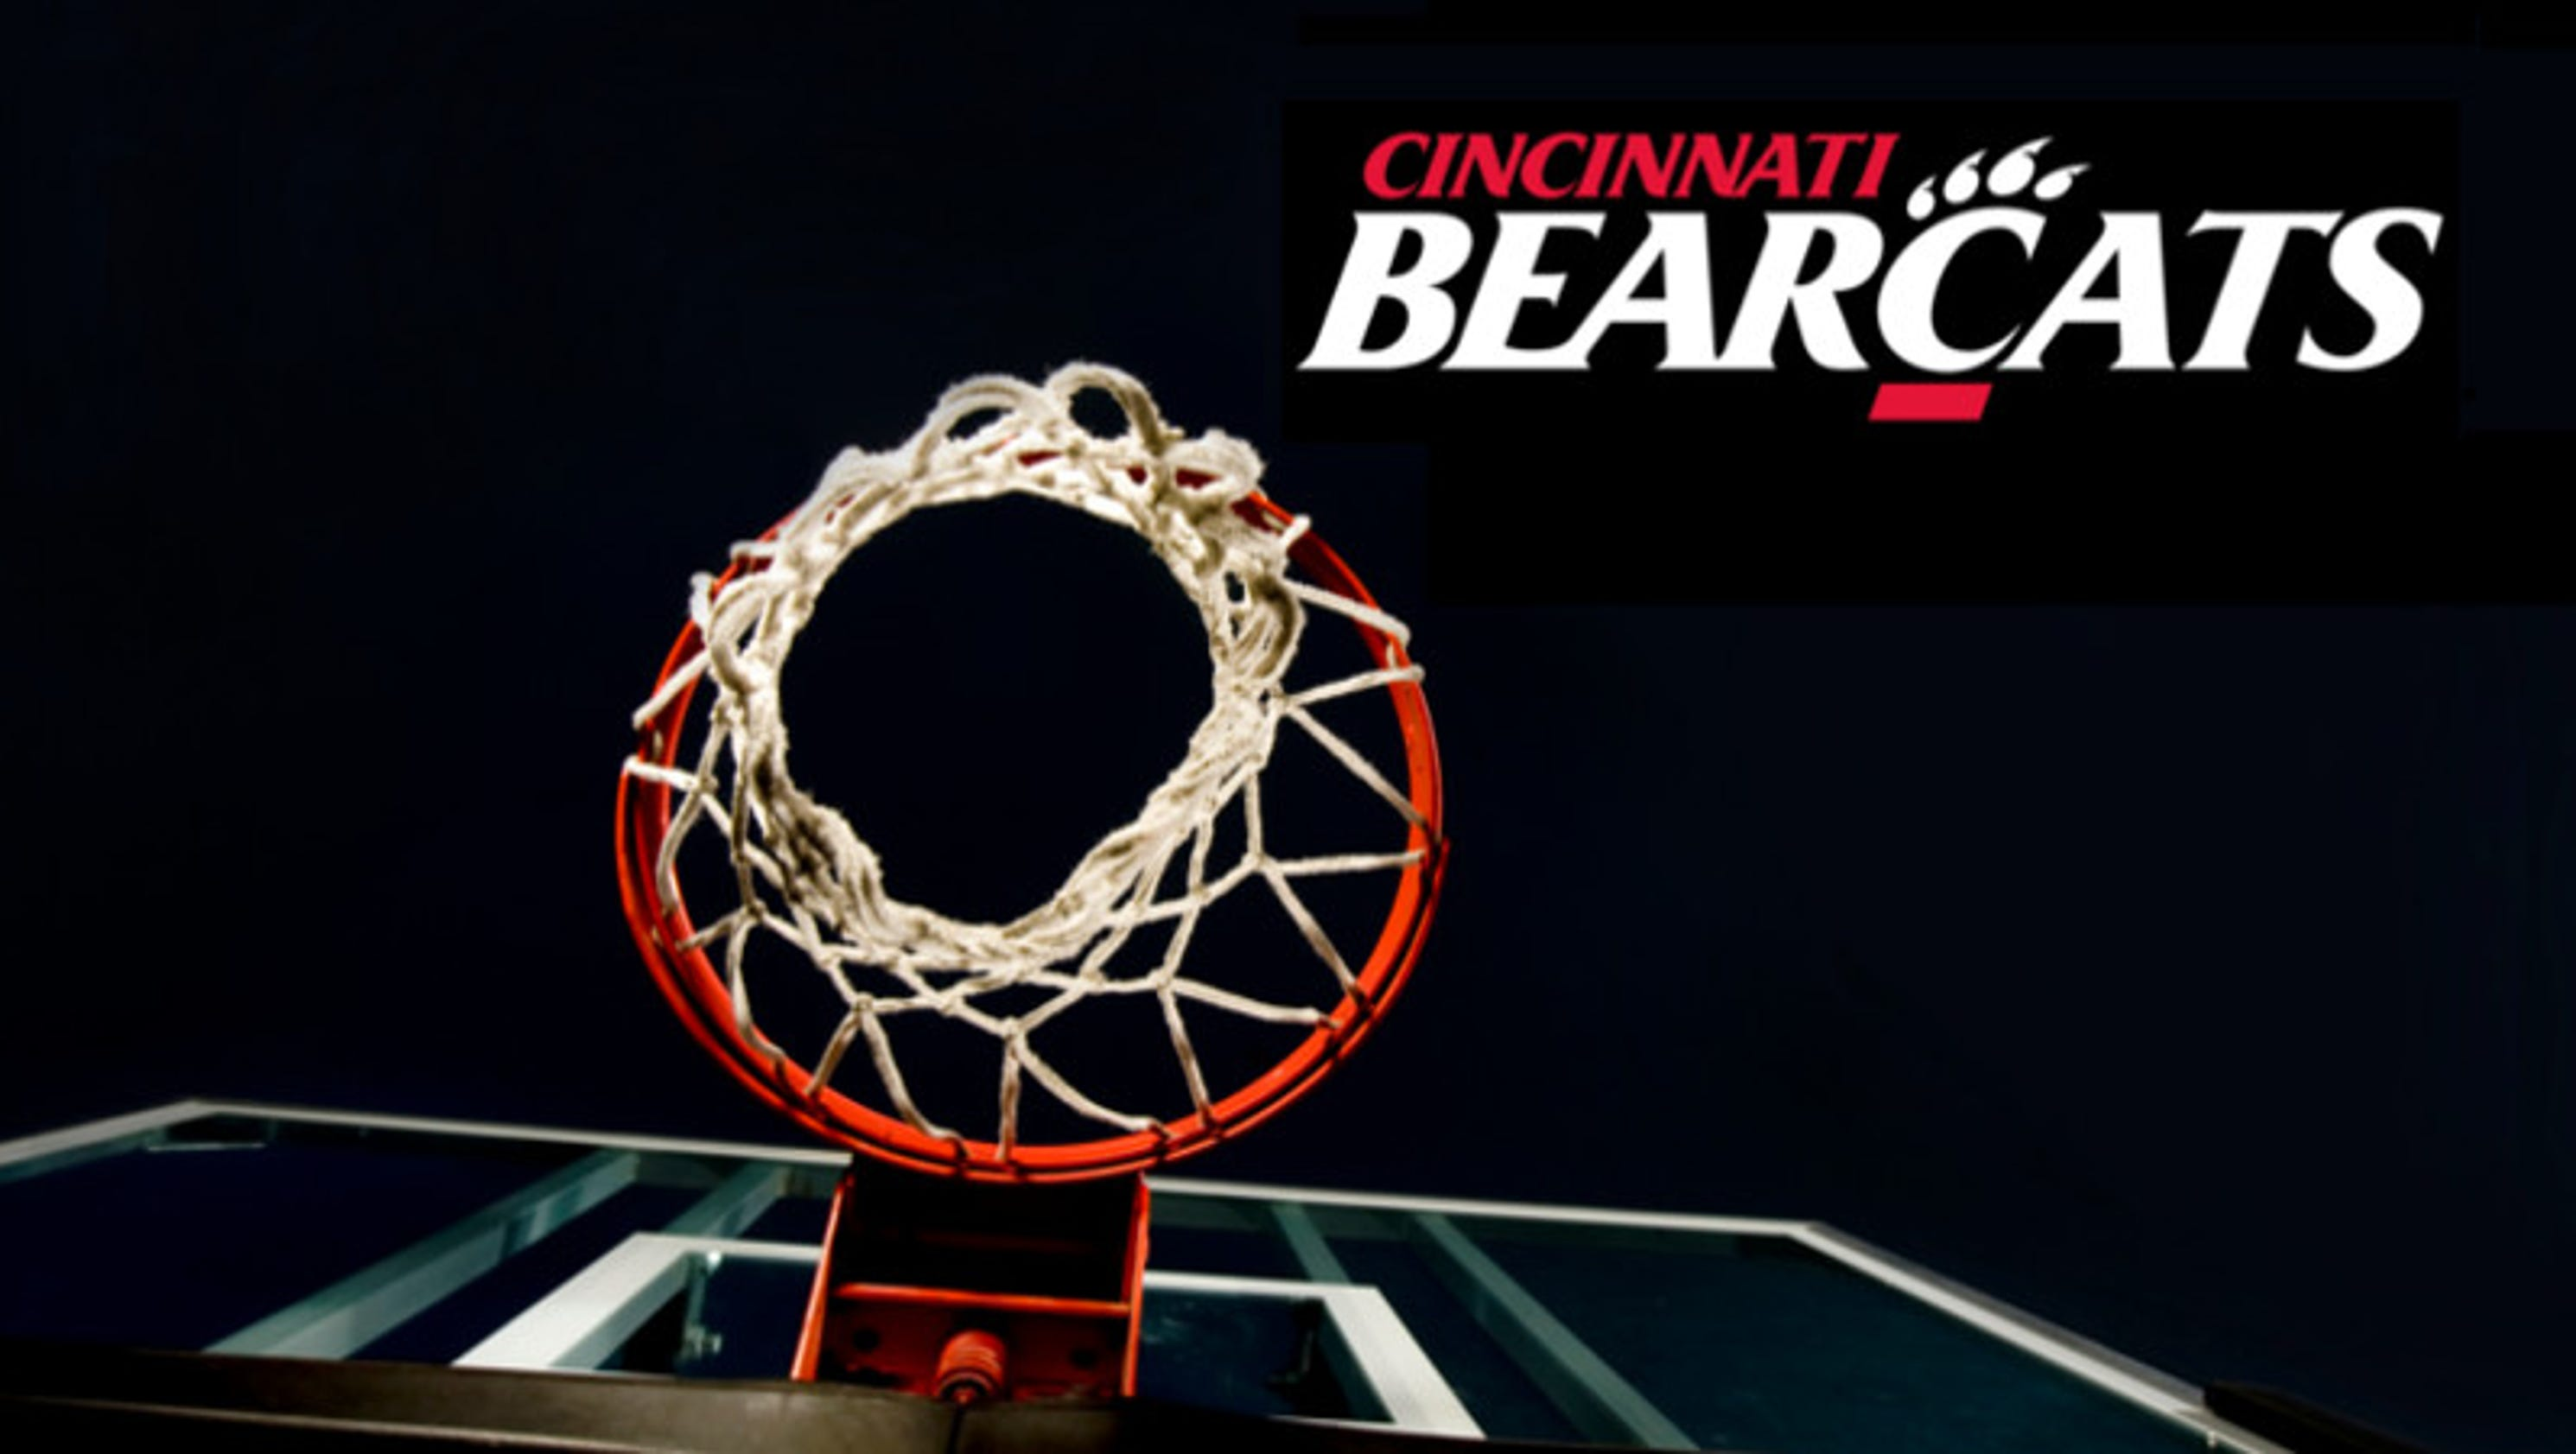 NCAA Cincinnati Bearcats College University Basketball ... |Cincinnati Bearcats